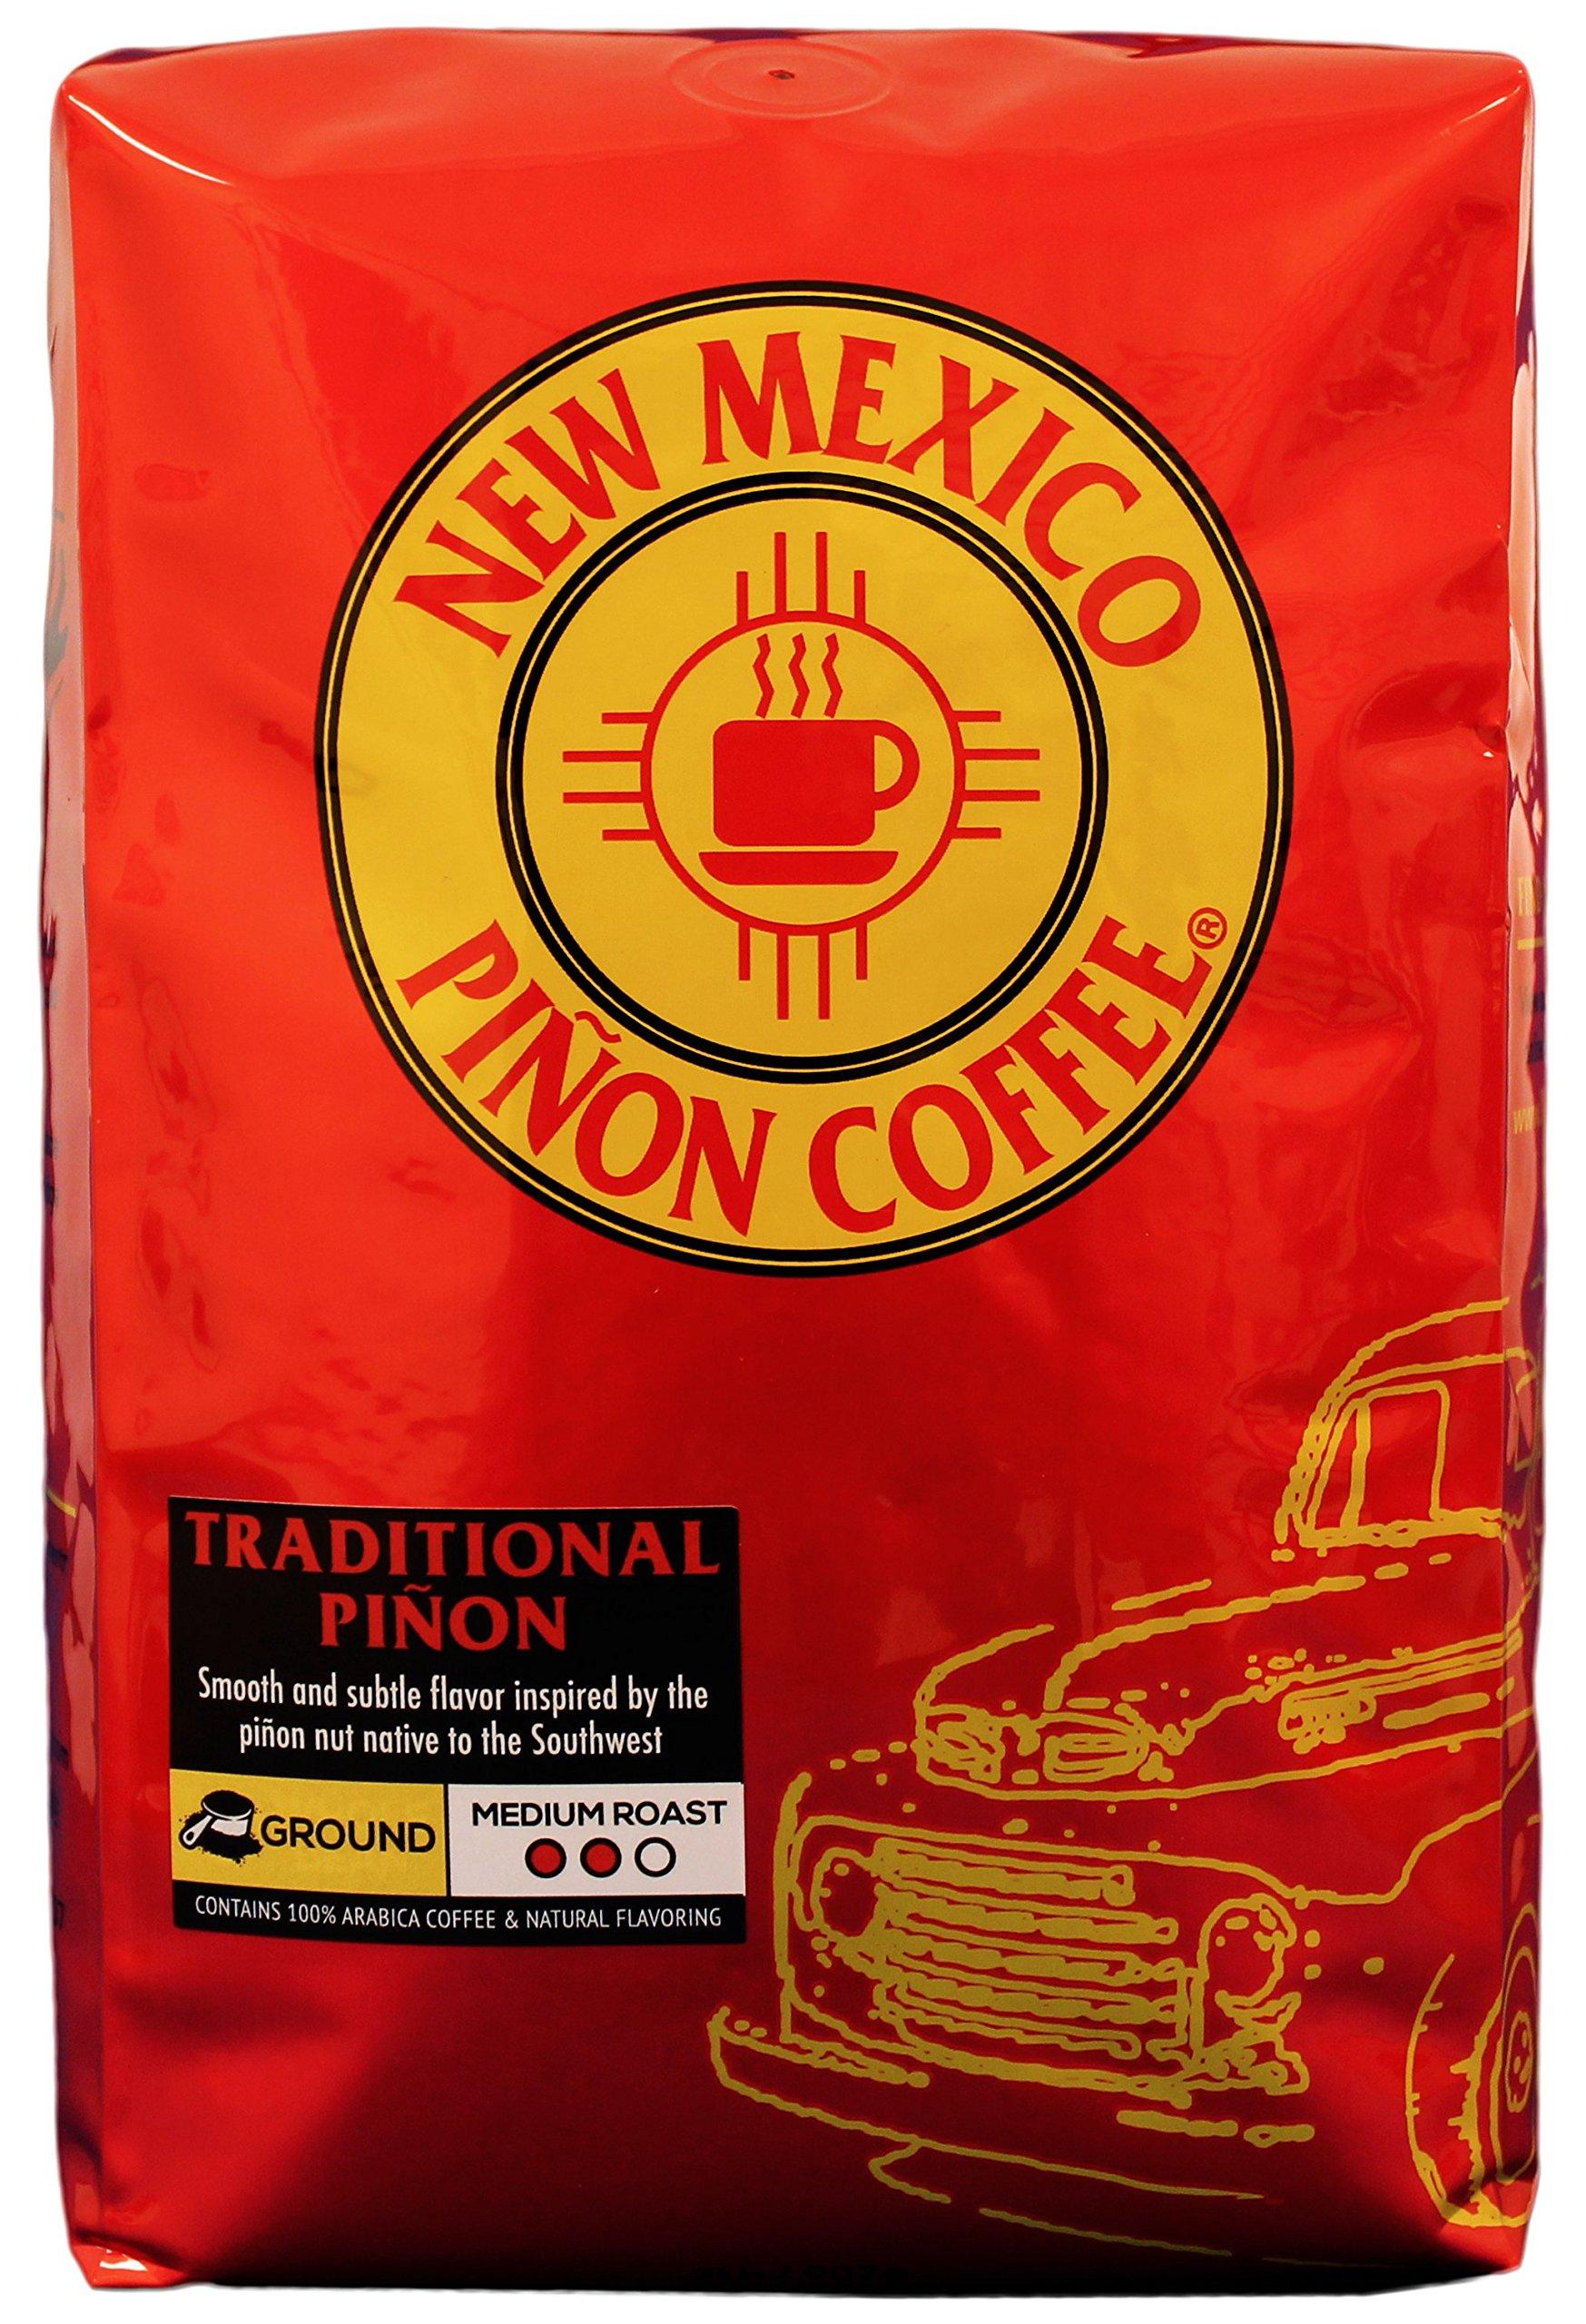 New Mexico Piñon Coffee Naturally Flavored Coffee (Traditional Piñon Ground, 2 pound)